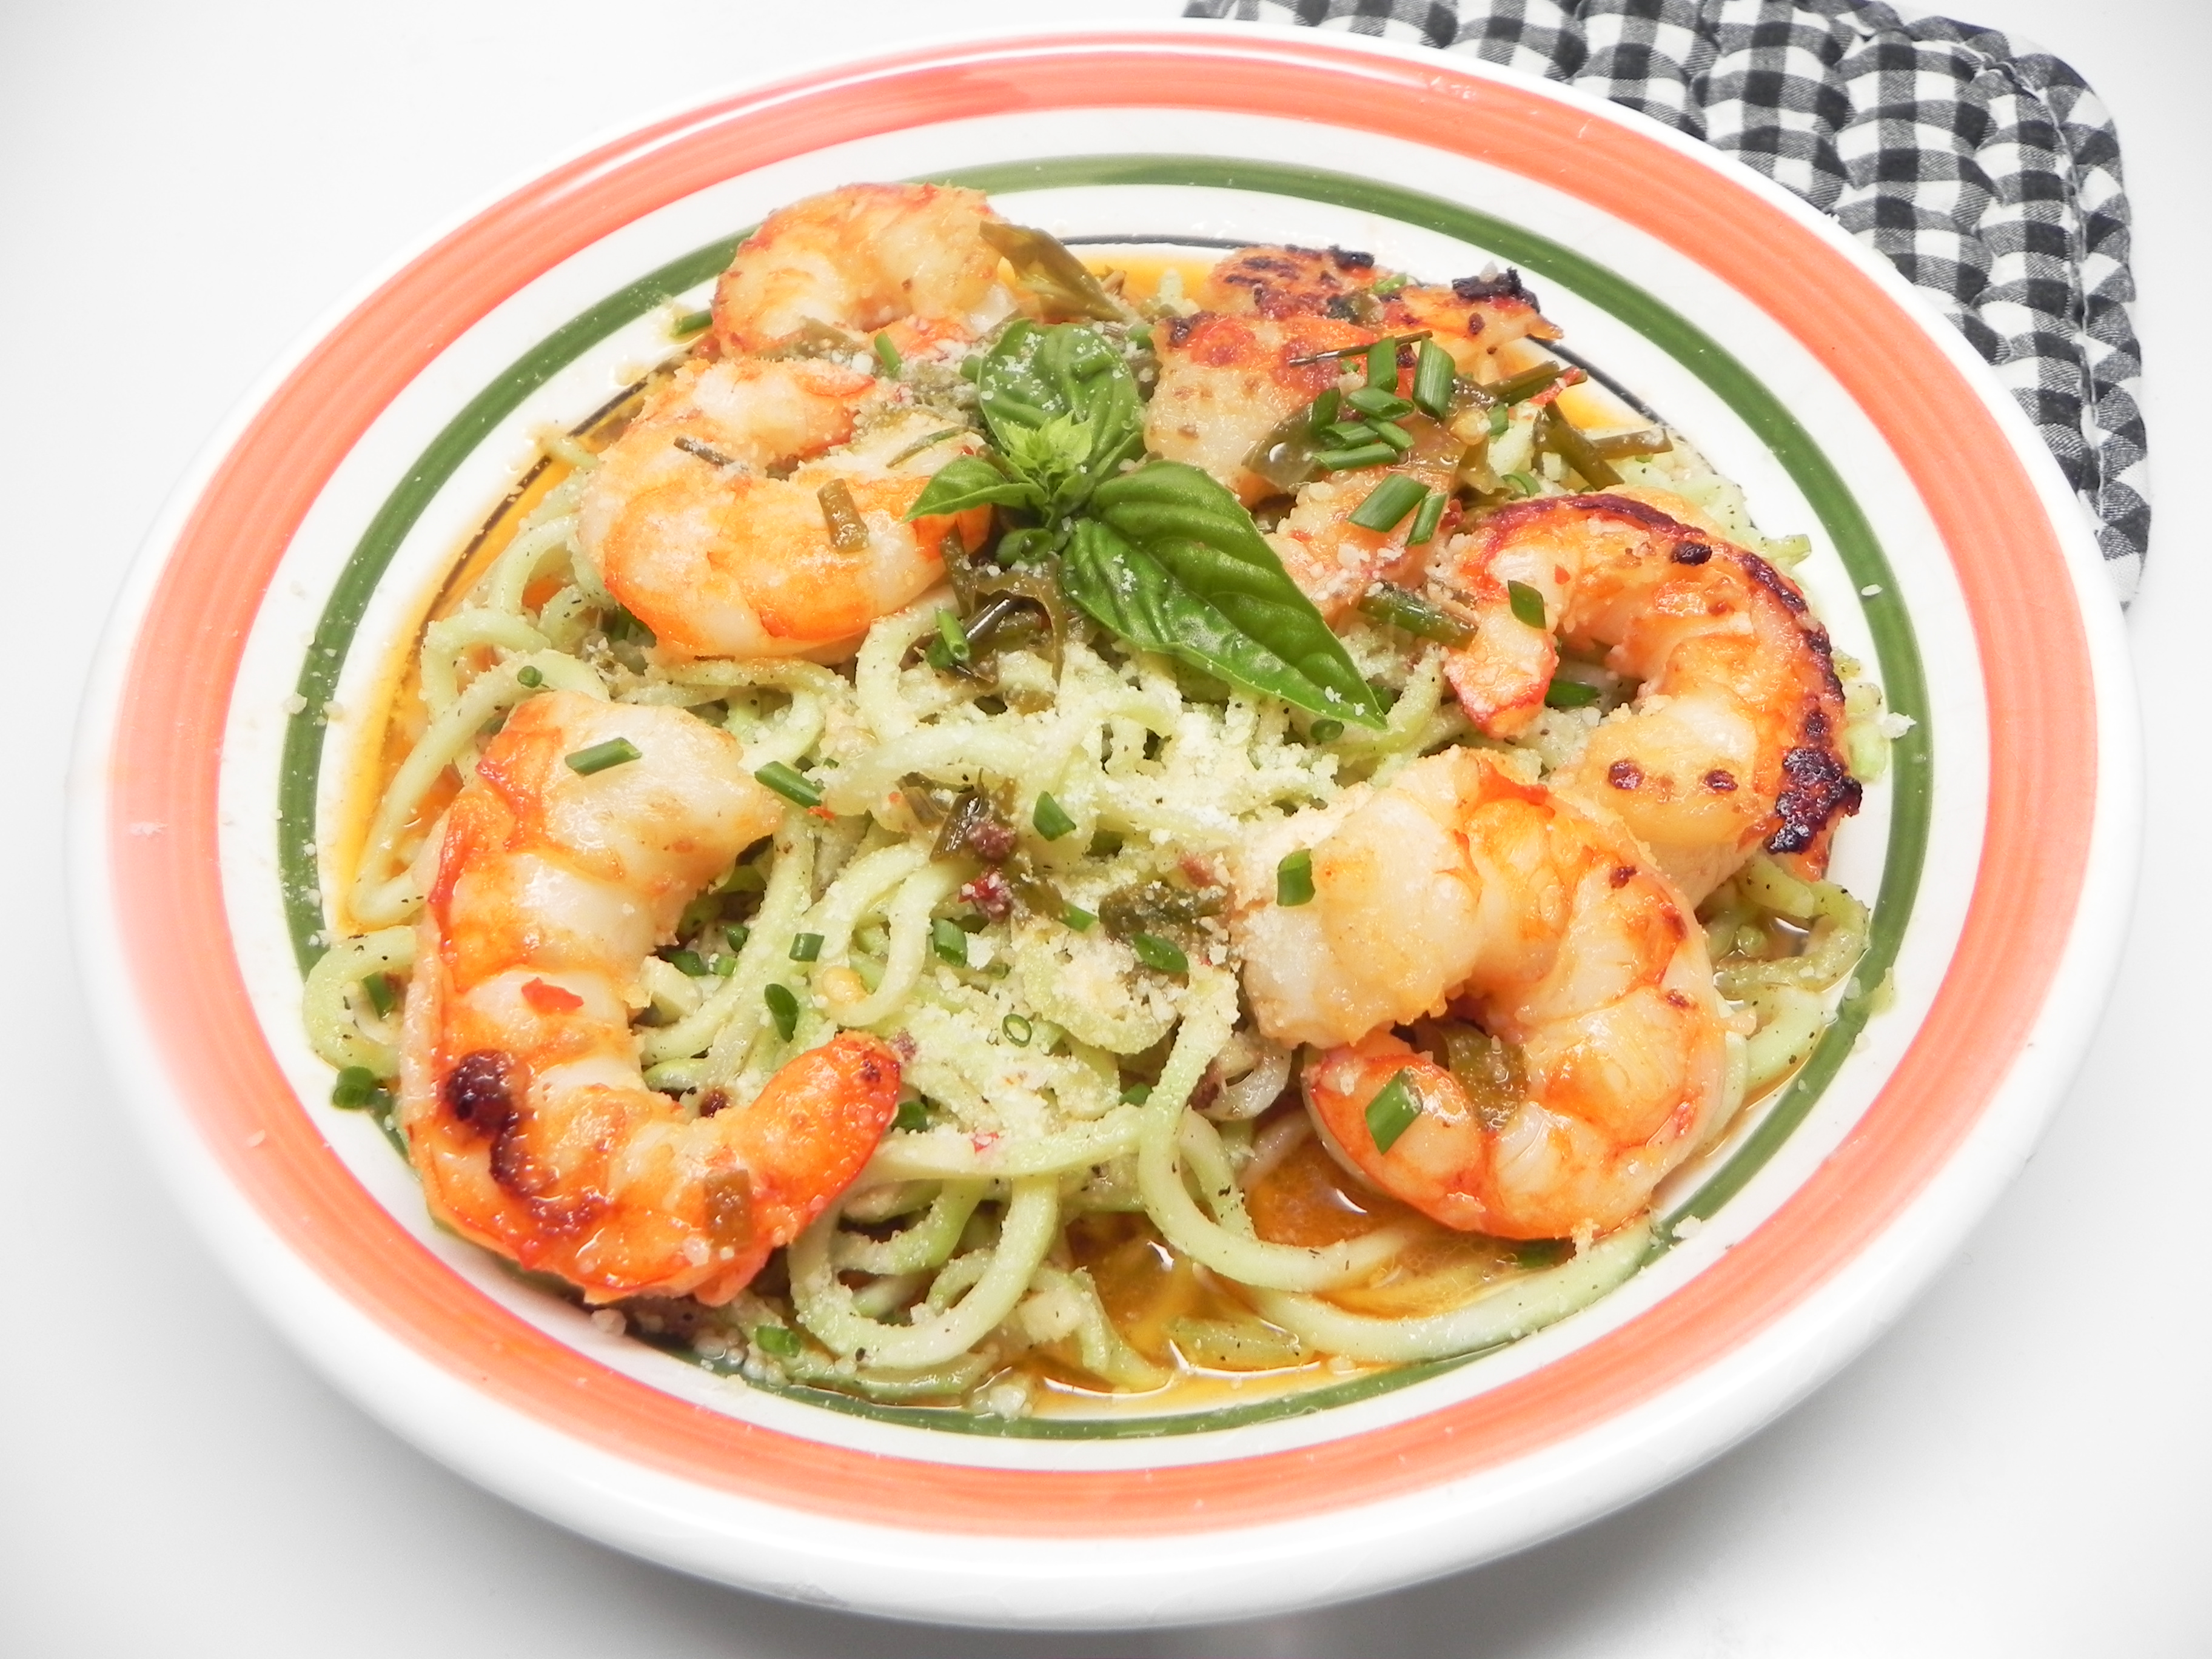 Keto Shrimp Scampi with Broccoli Noodles